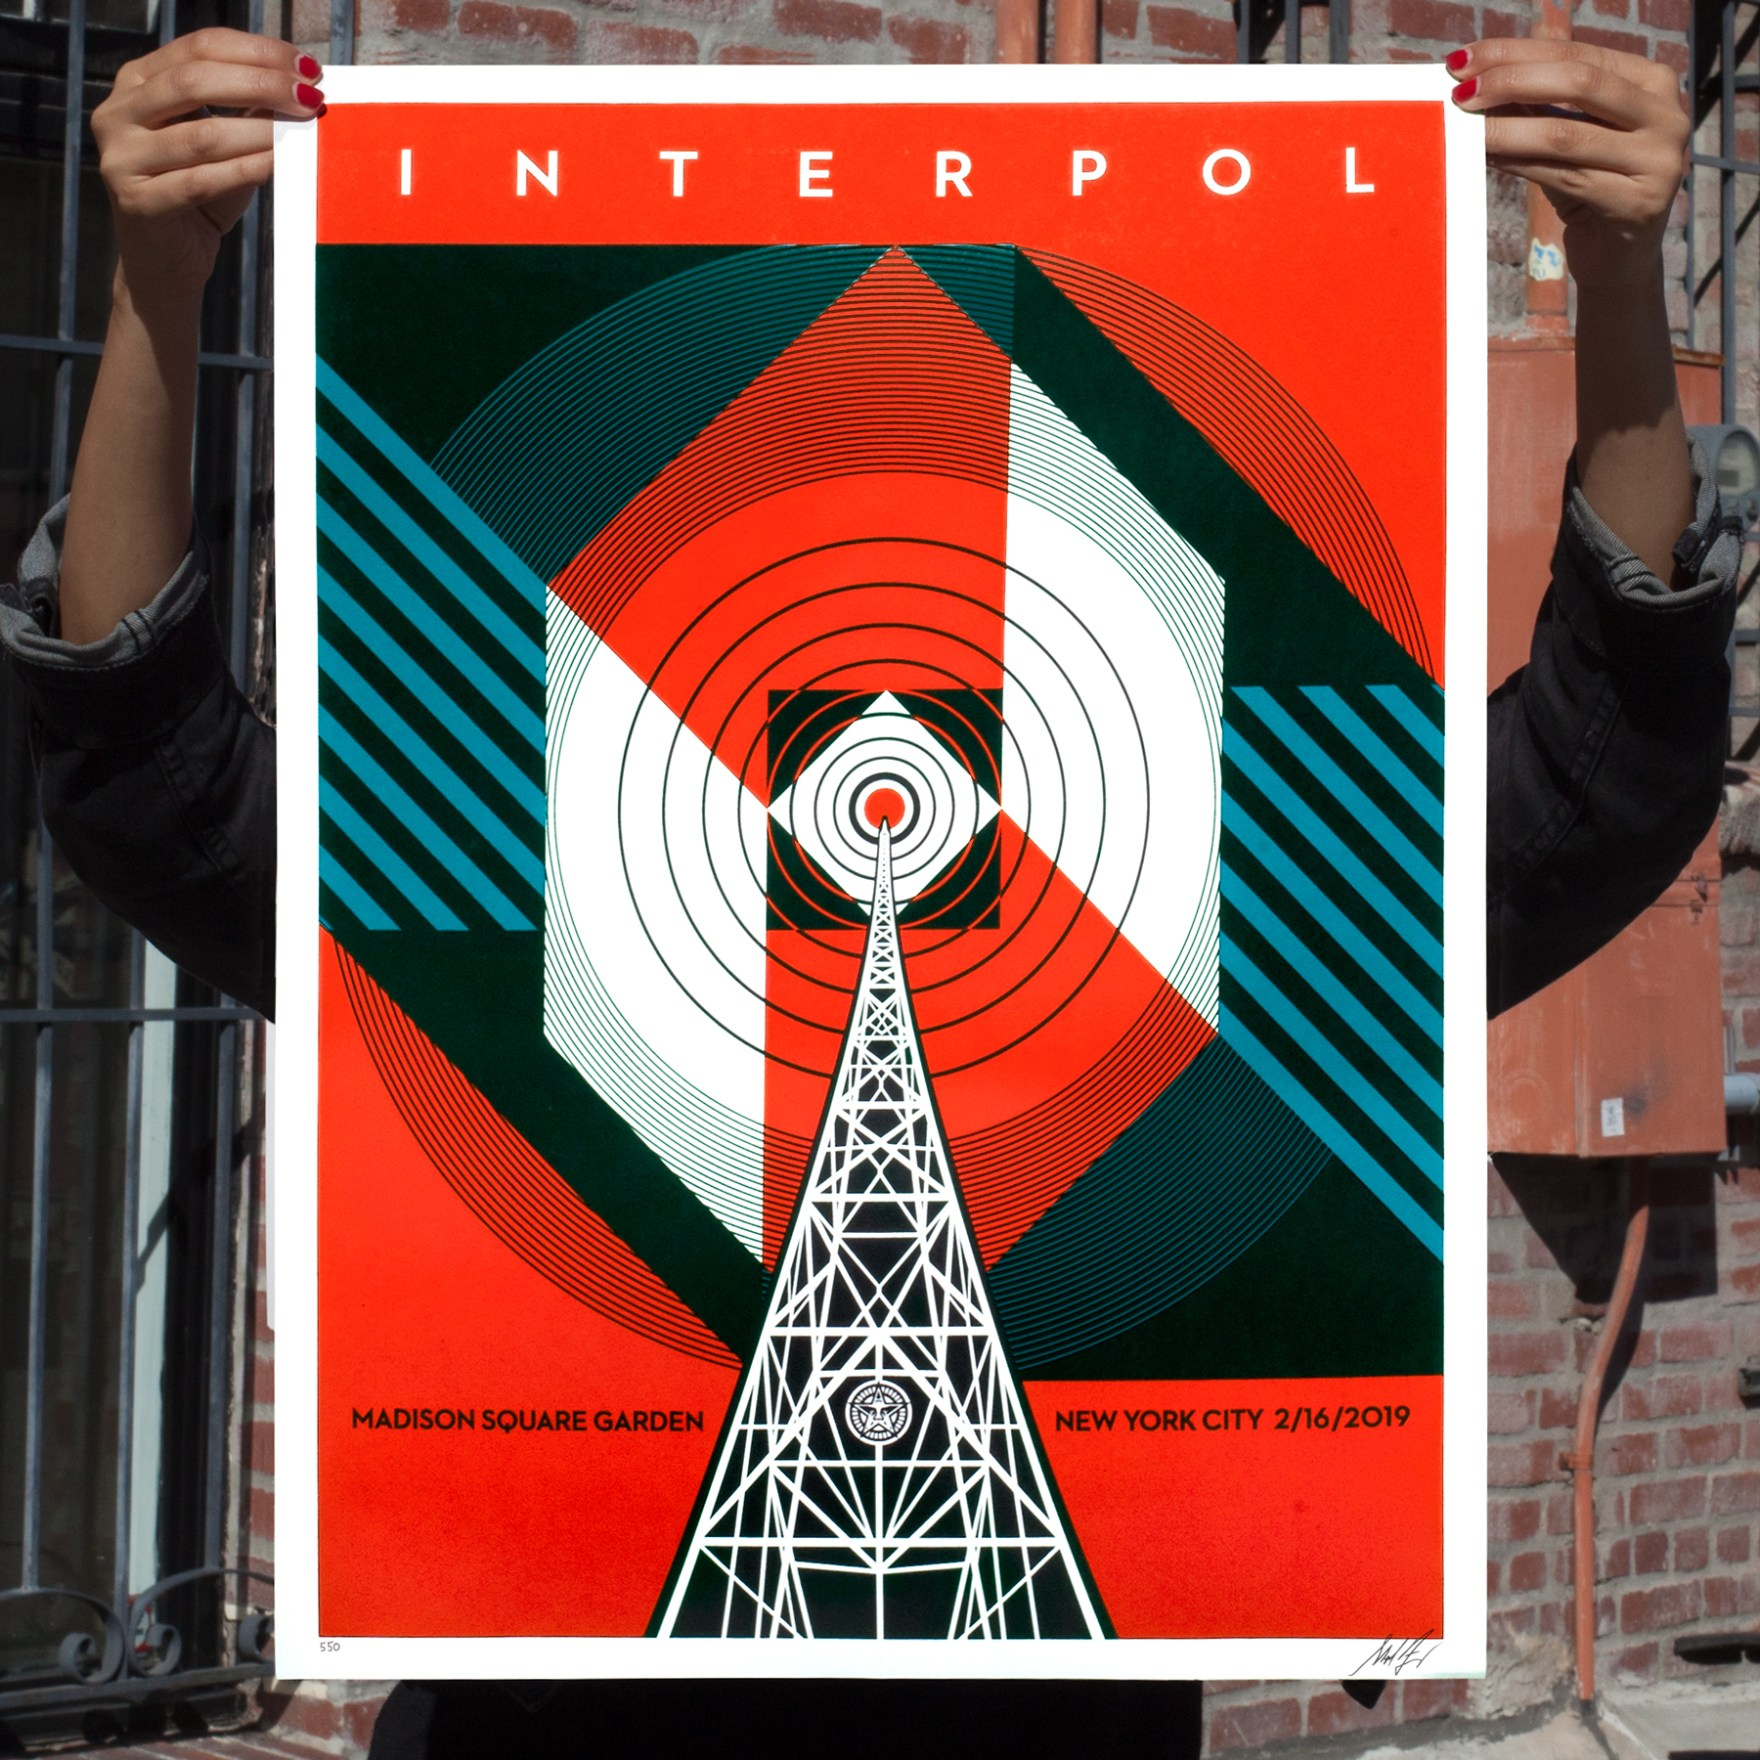 Interpol-to-post.jpg